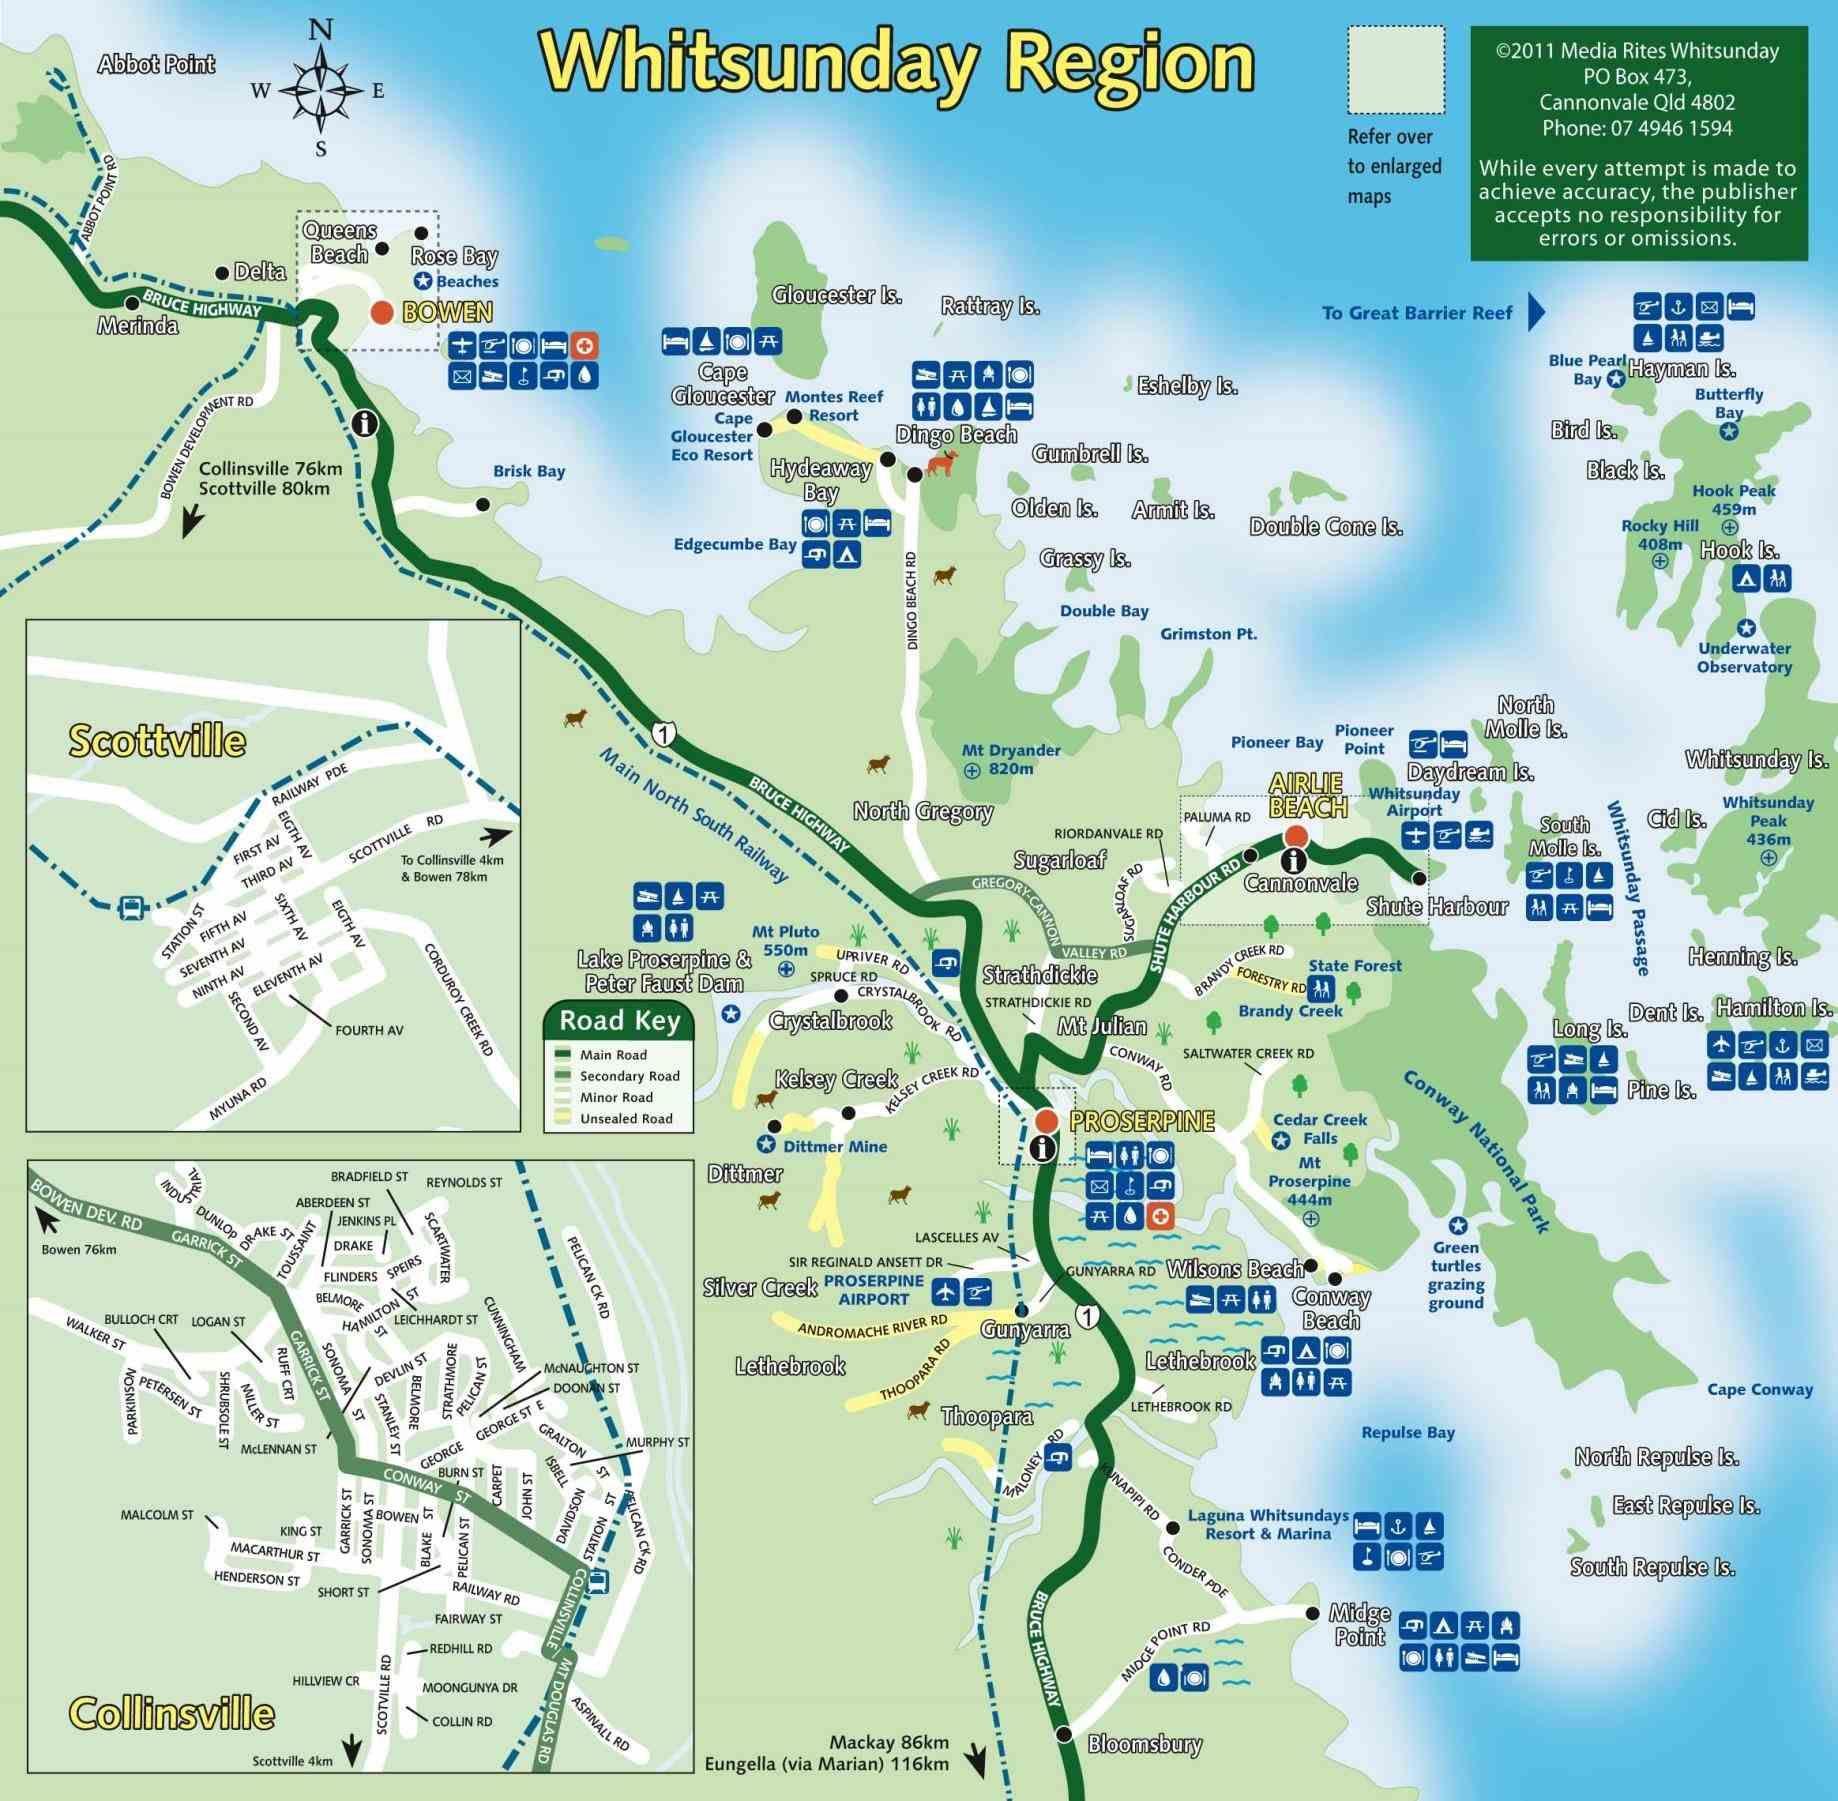 Area Queensland Describes Airlie Beach Australia Map Where Is - Australia map queensland